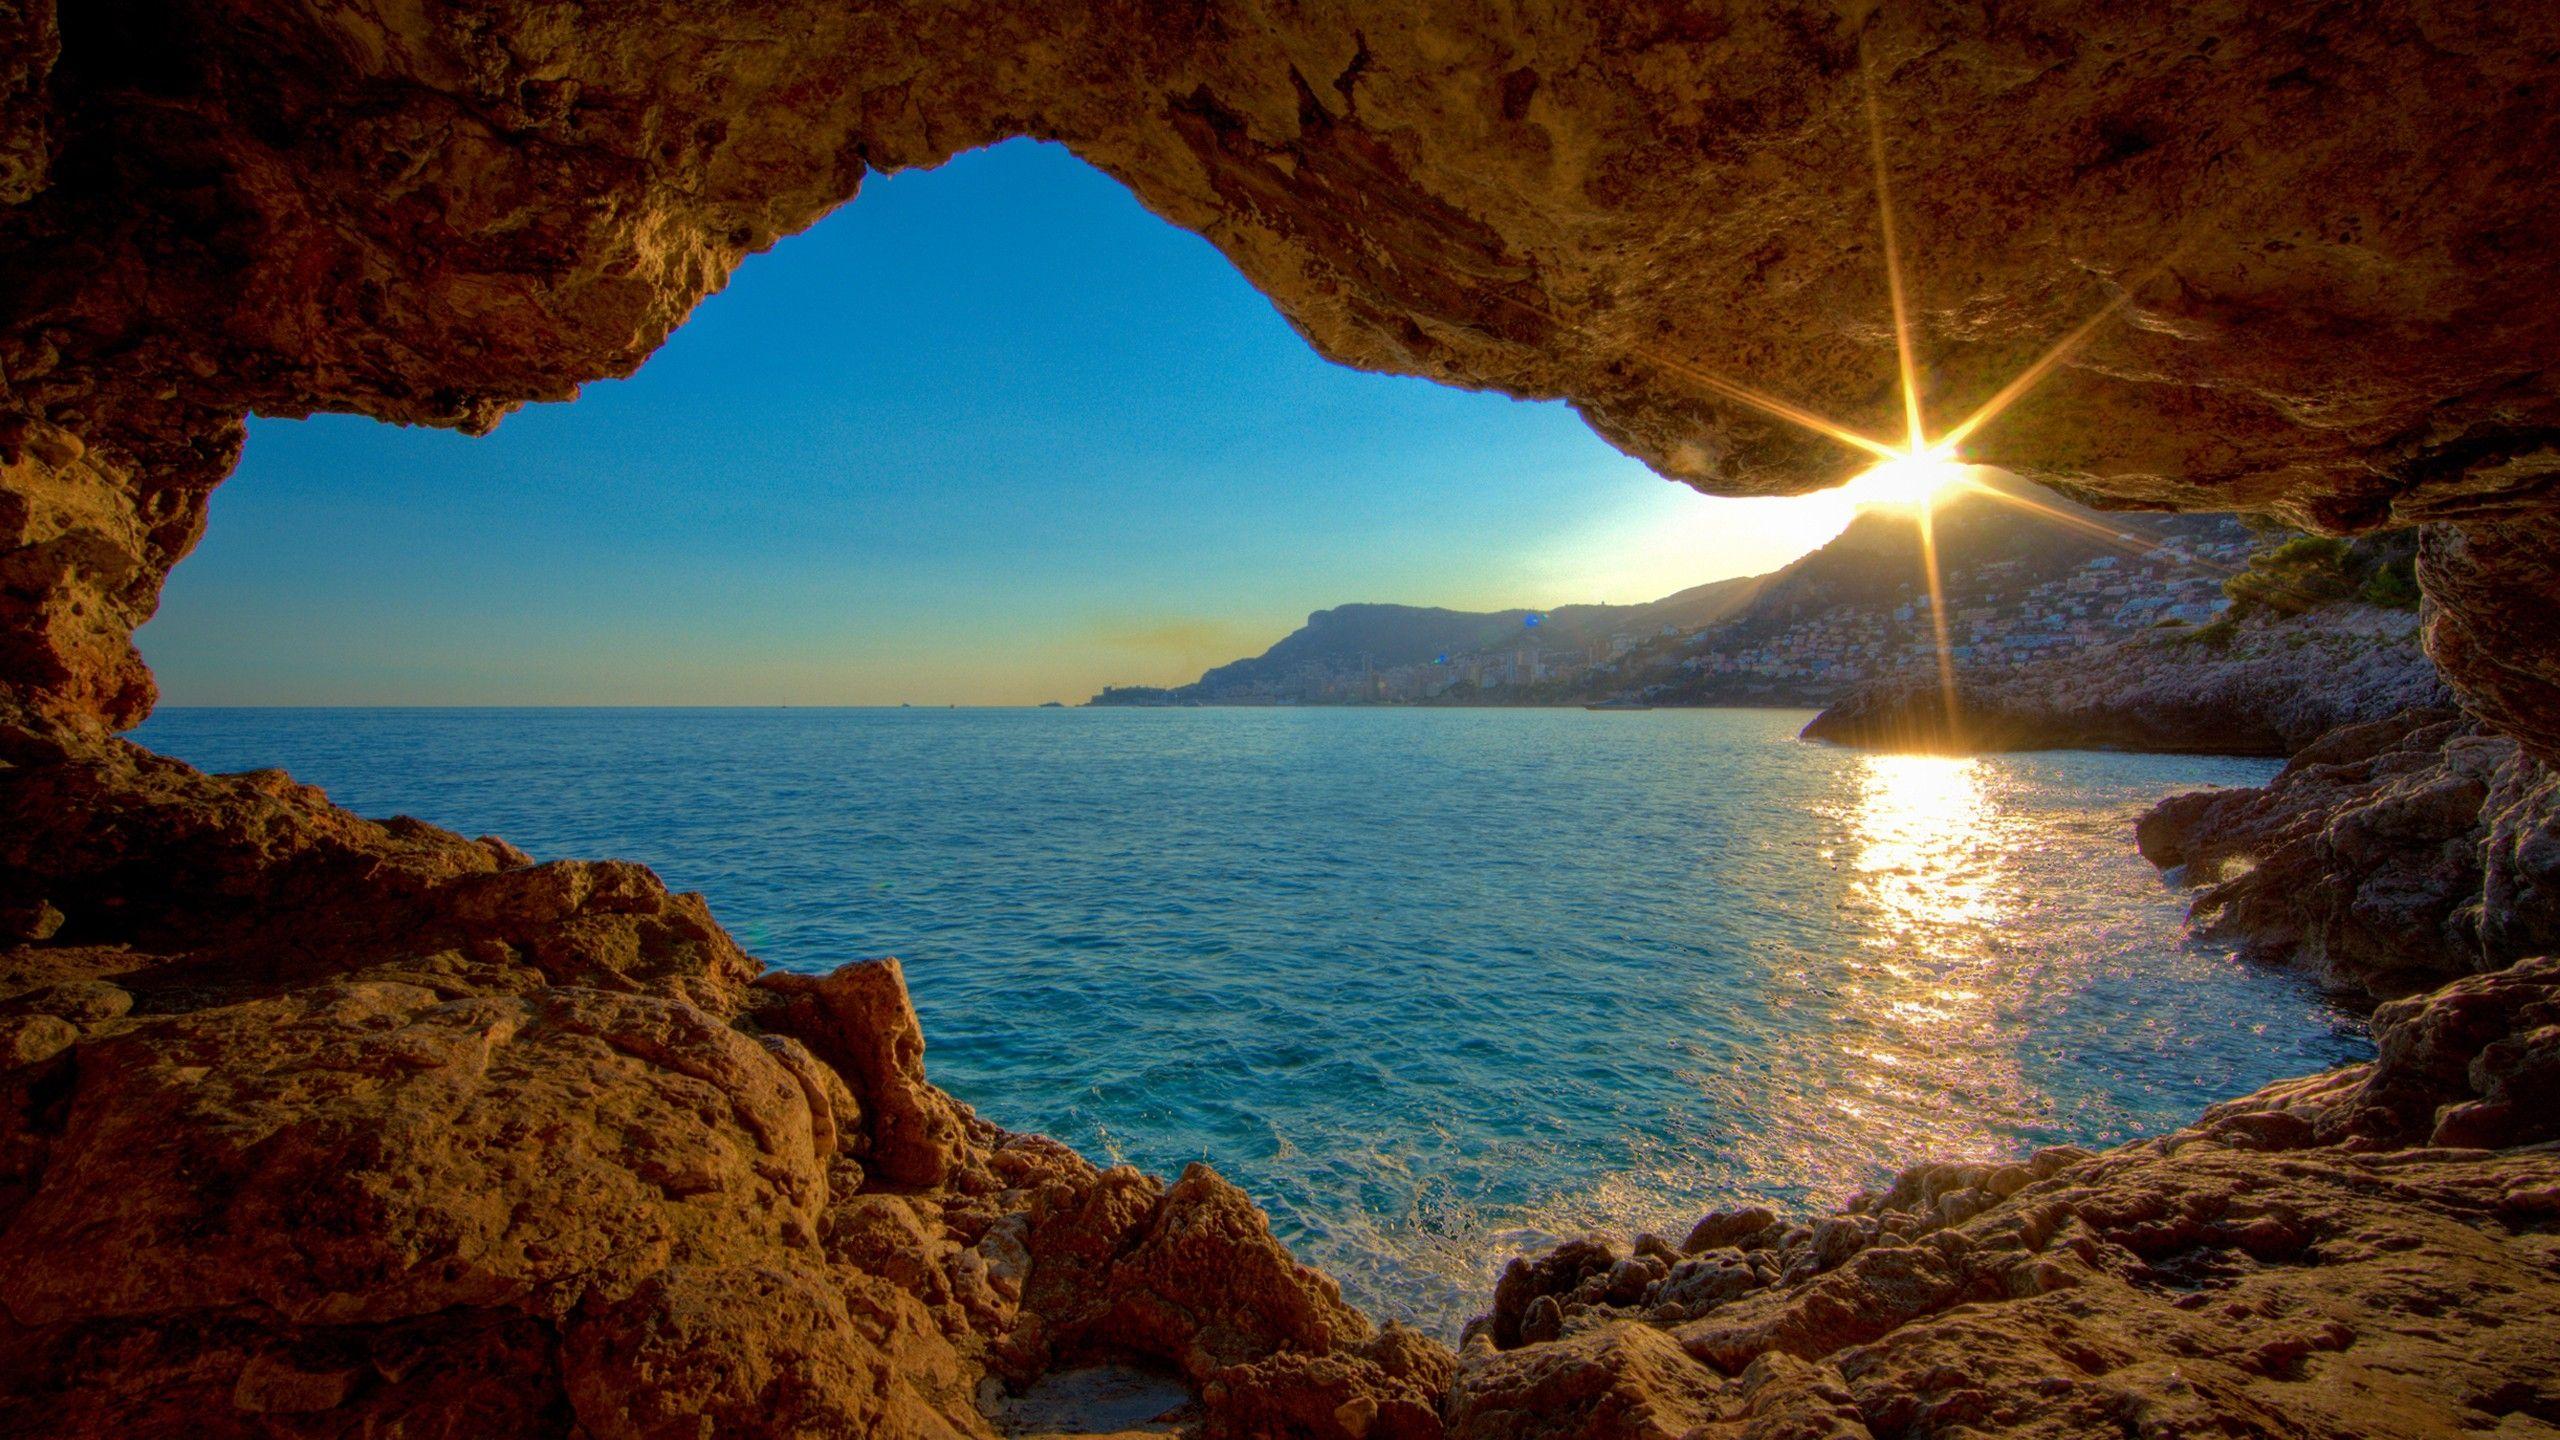 Cote D Azur Wallpaper Beautiful Places Nature Beautiful Nature